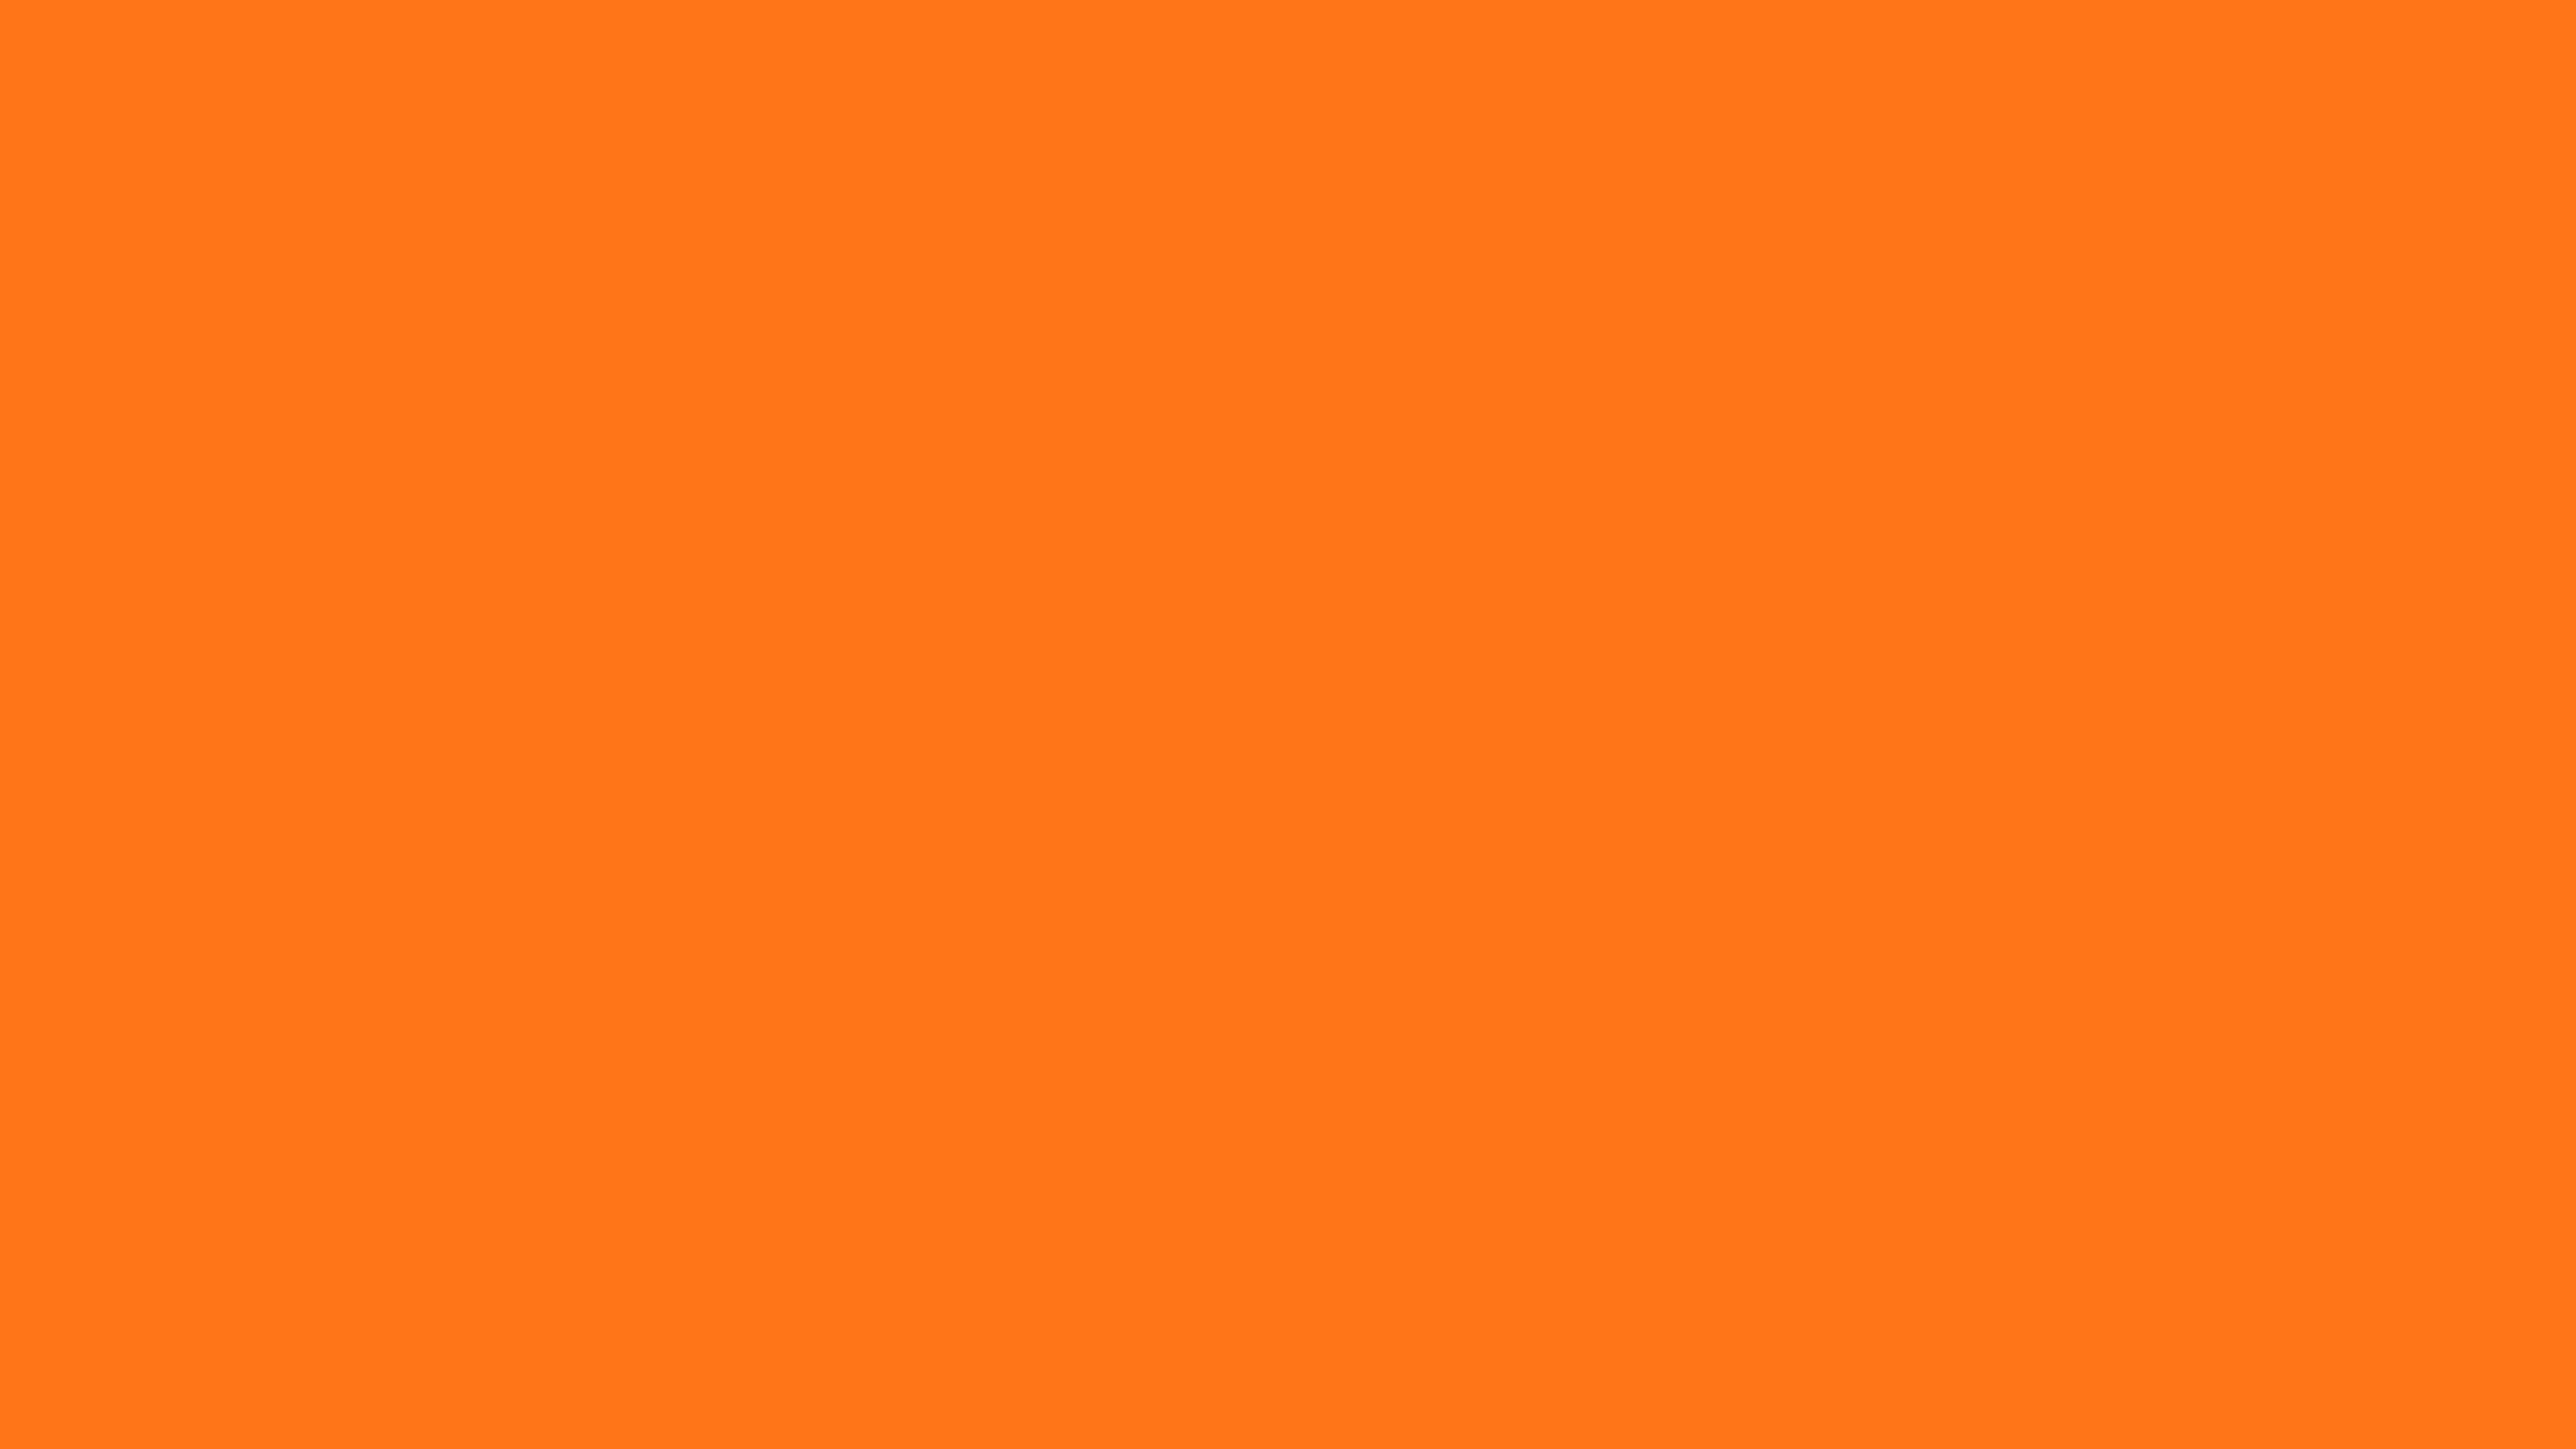 3840x2160 Pumpkin Solid Color Background